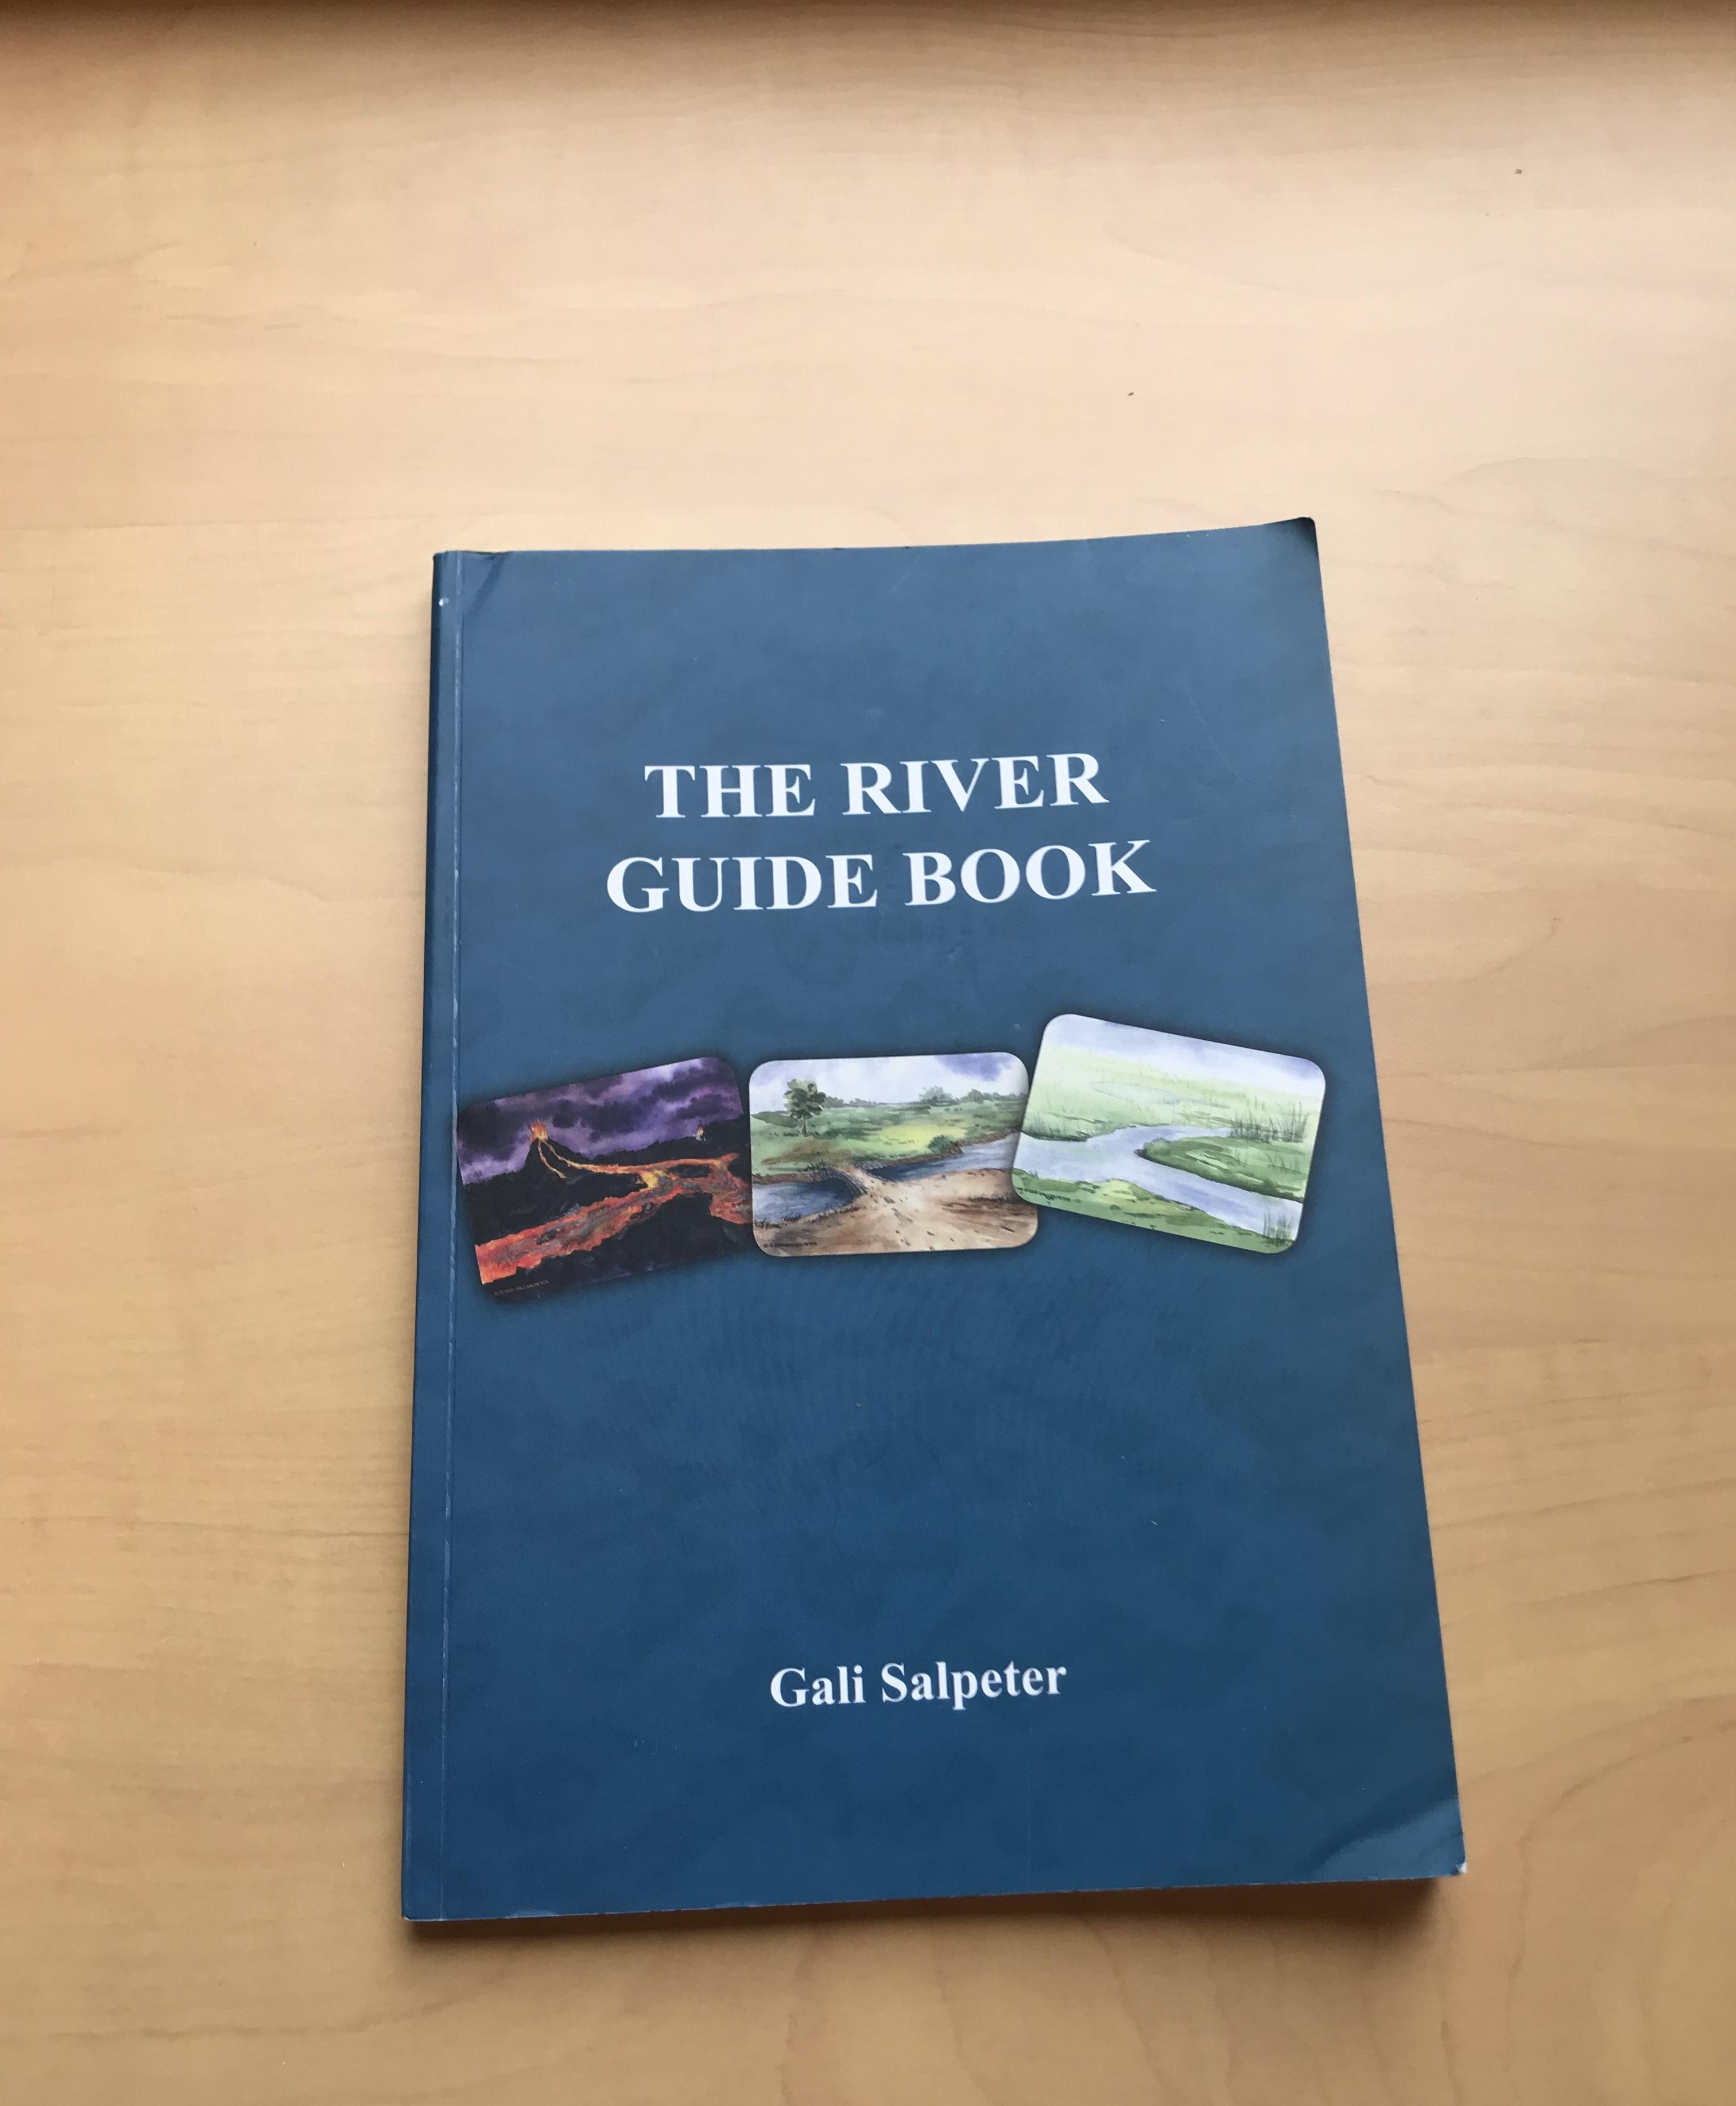 The River Guide Book